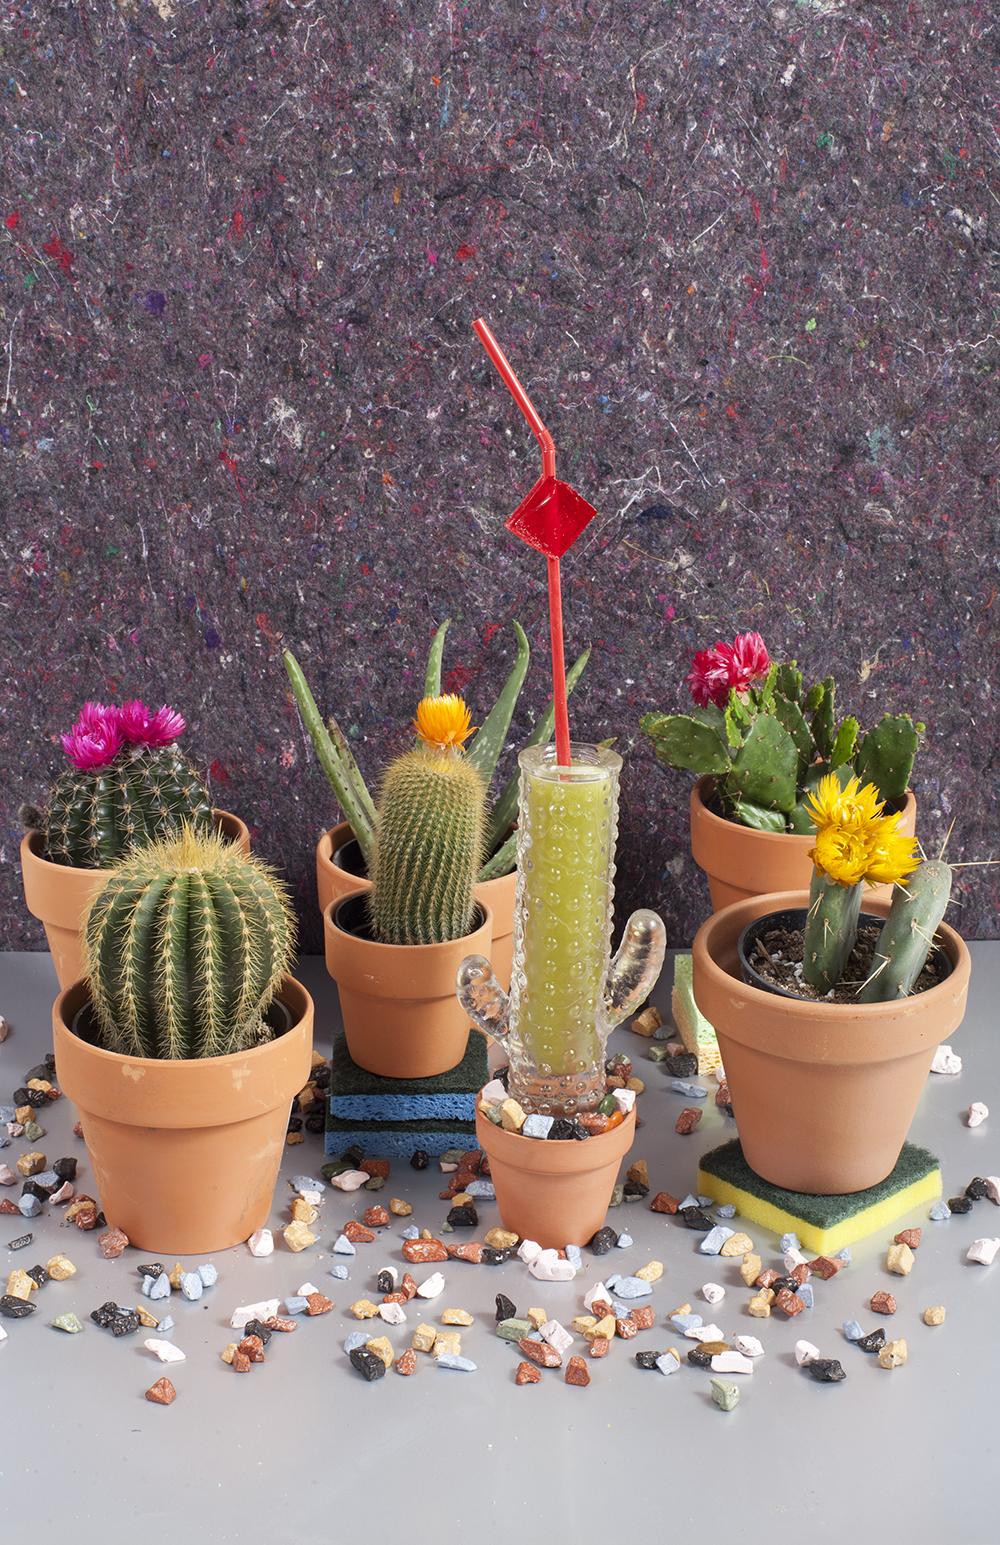 Cactus Cooler cropped-WEB.jpg